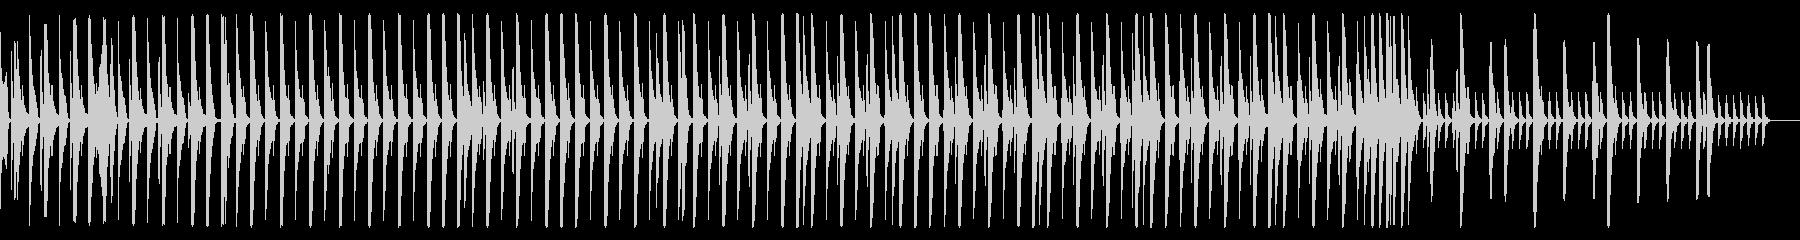 EDM風 リズムのみ 1分の未再生の波形